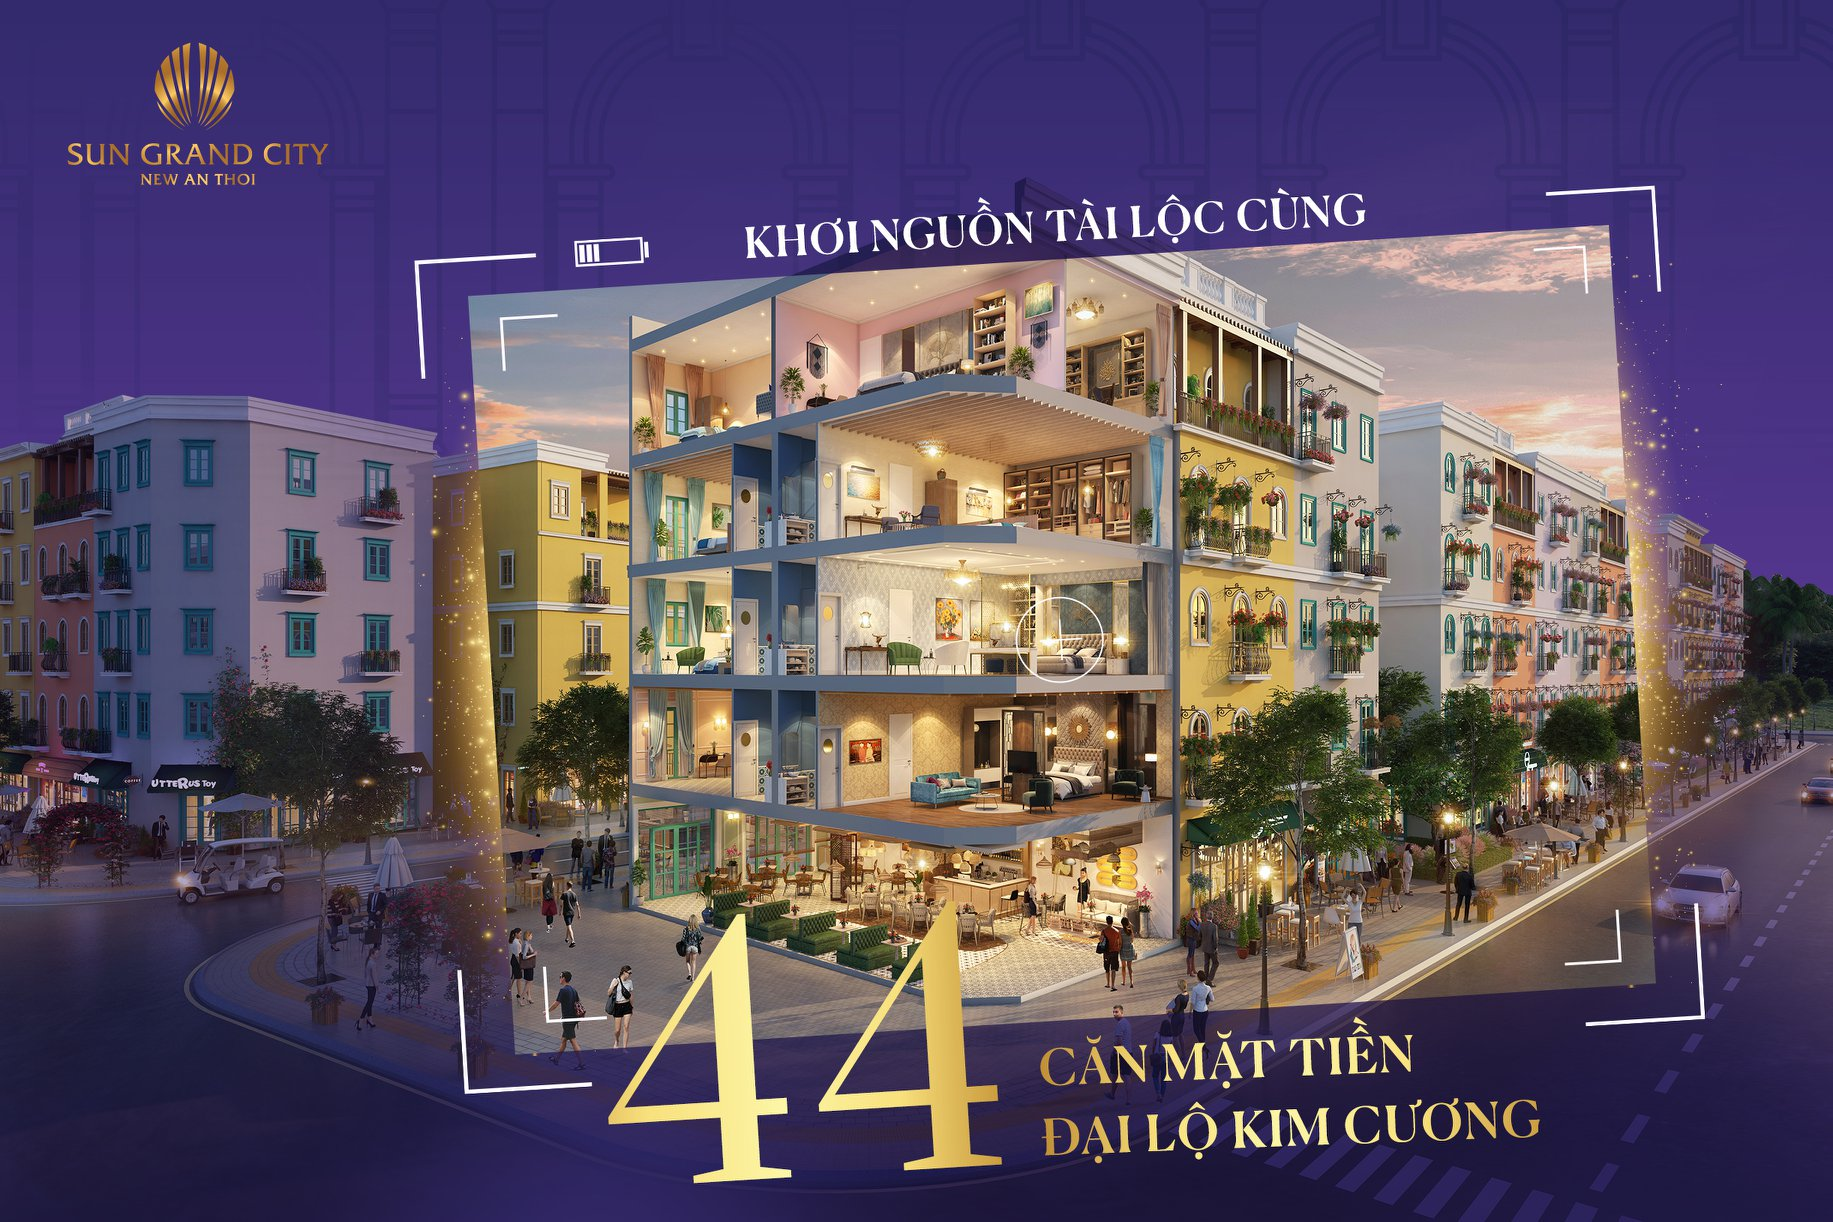 Shophouse Gateway An Thới - Duy nhất 44 căn kinh doanh đẳng cấp, sinh lời hấp dẫn 2